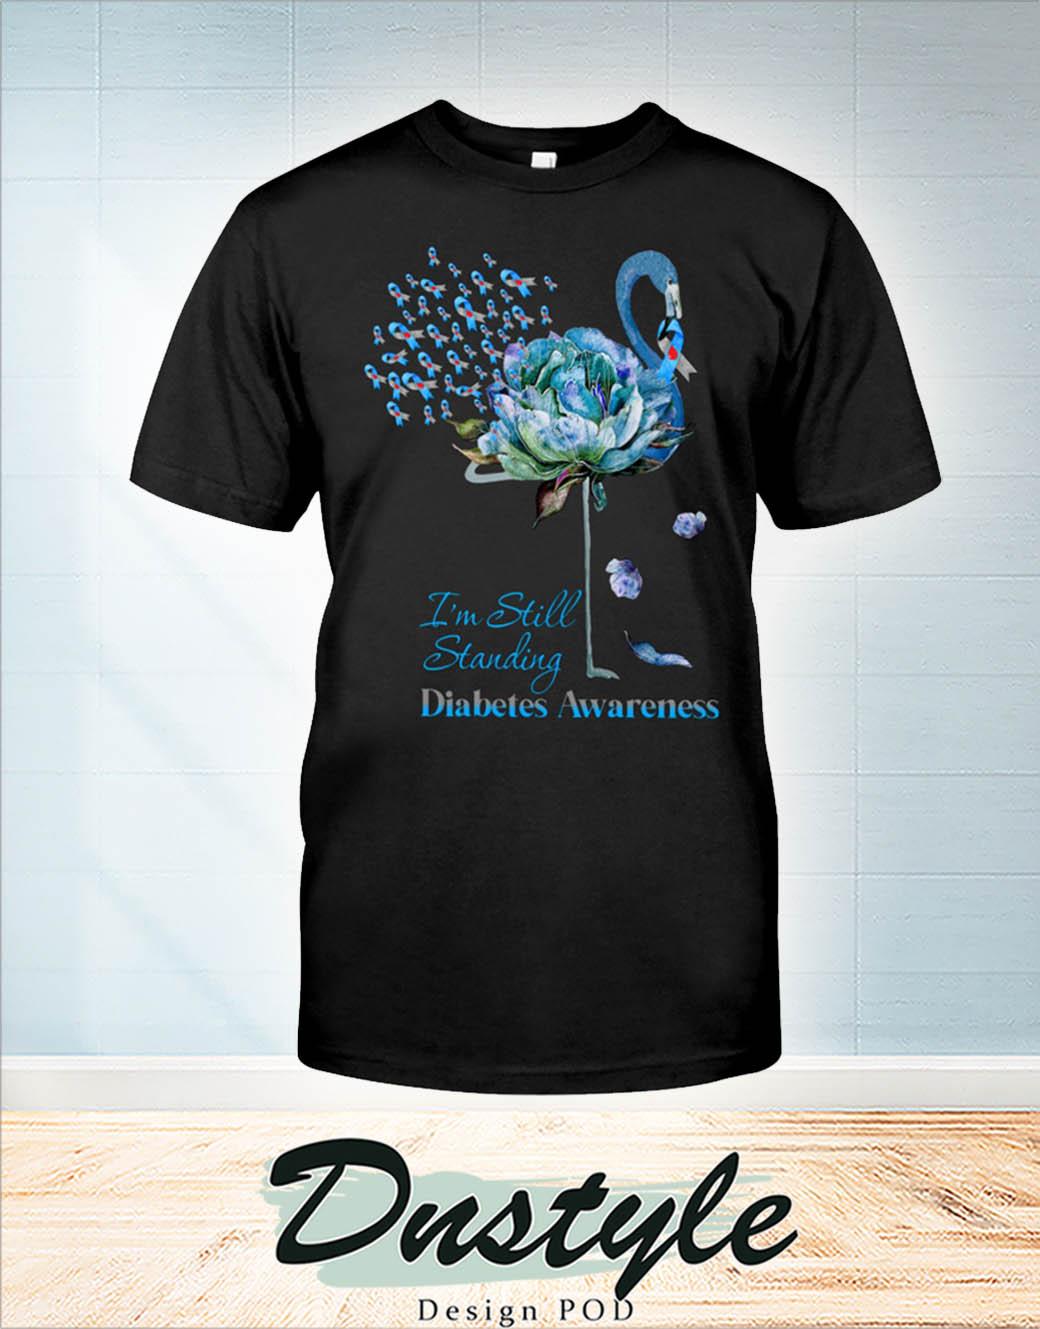 Flamingo I'm still standing diabetes awareness t-shirt